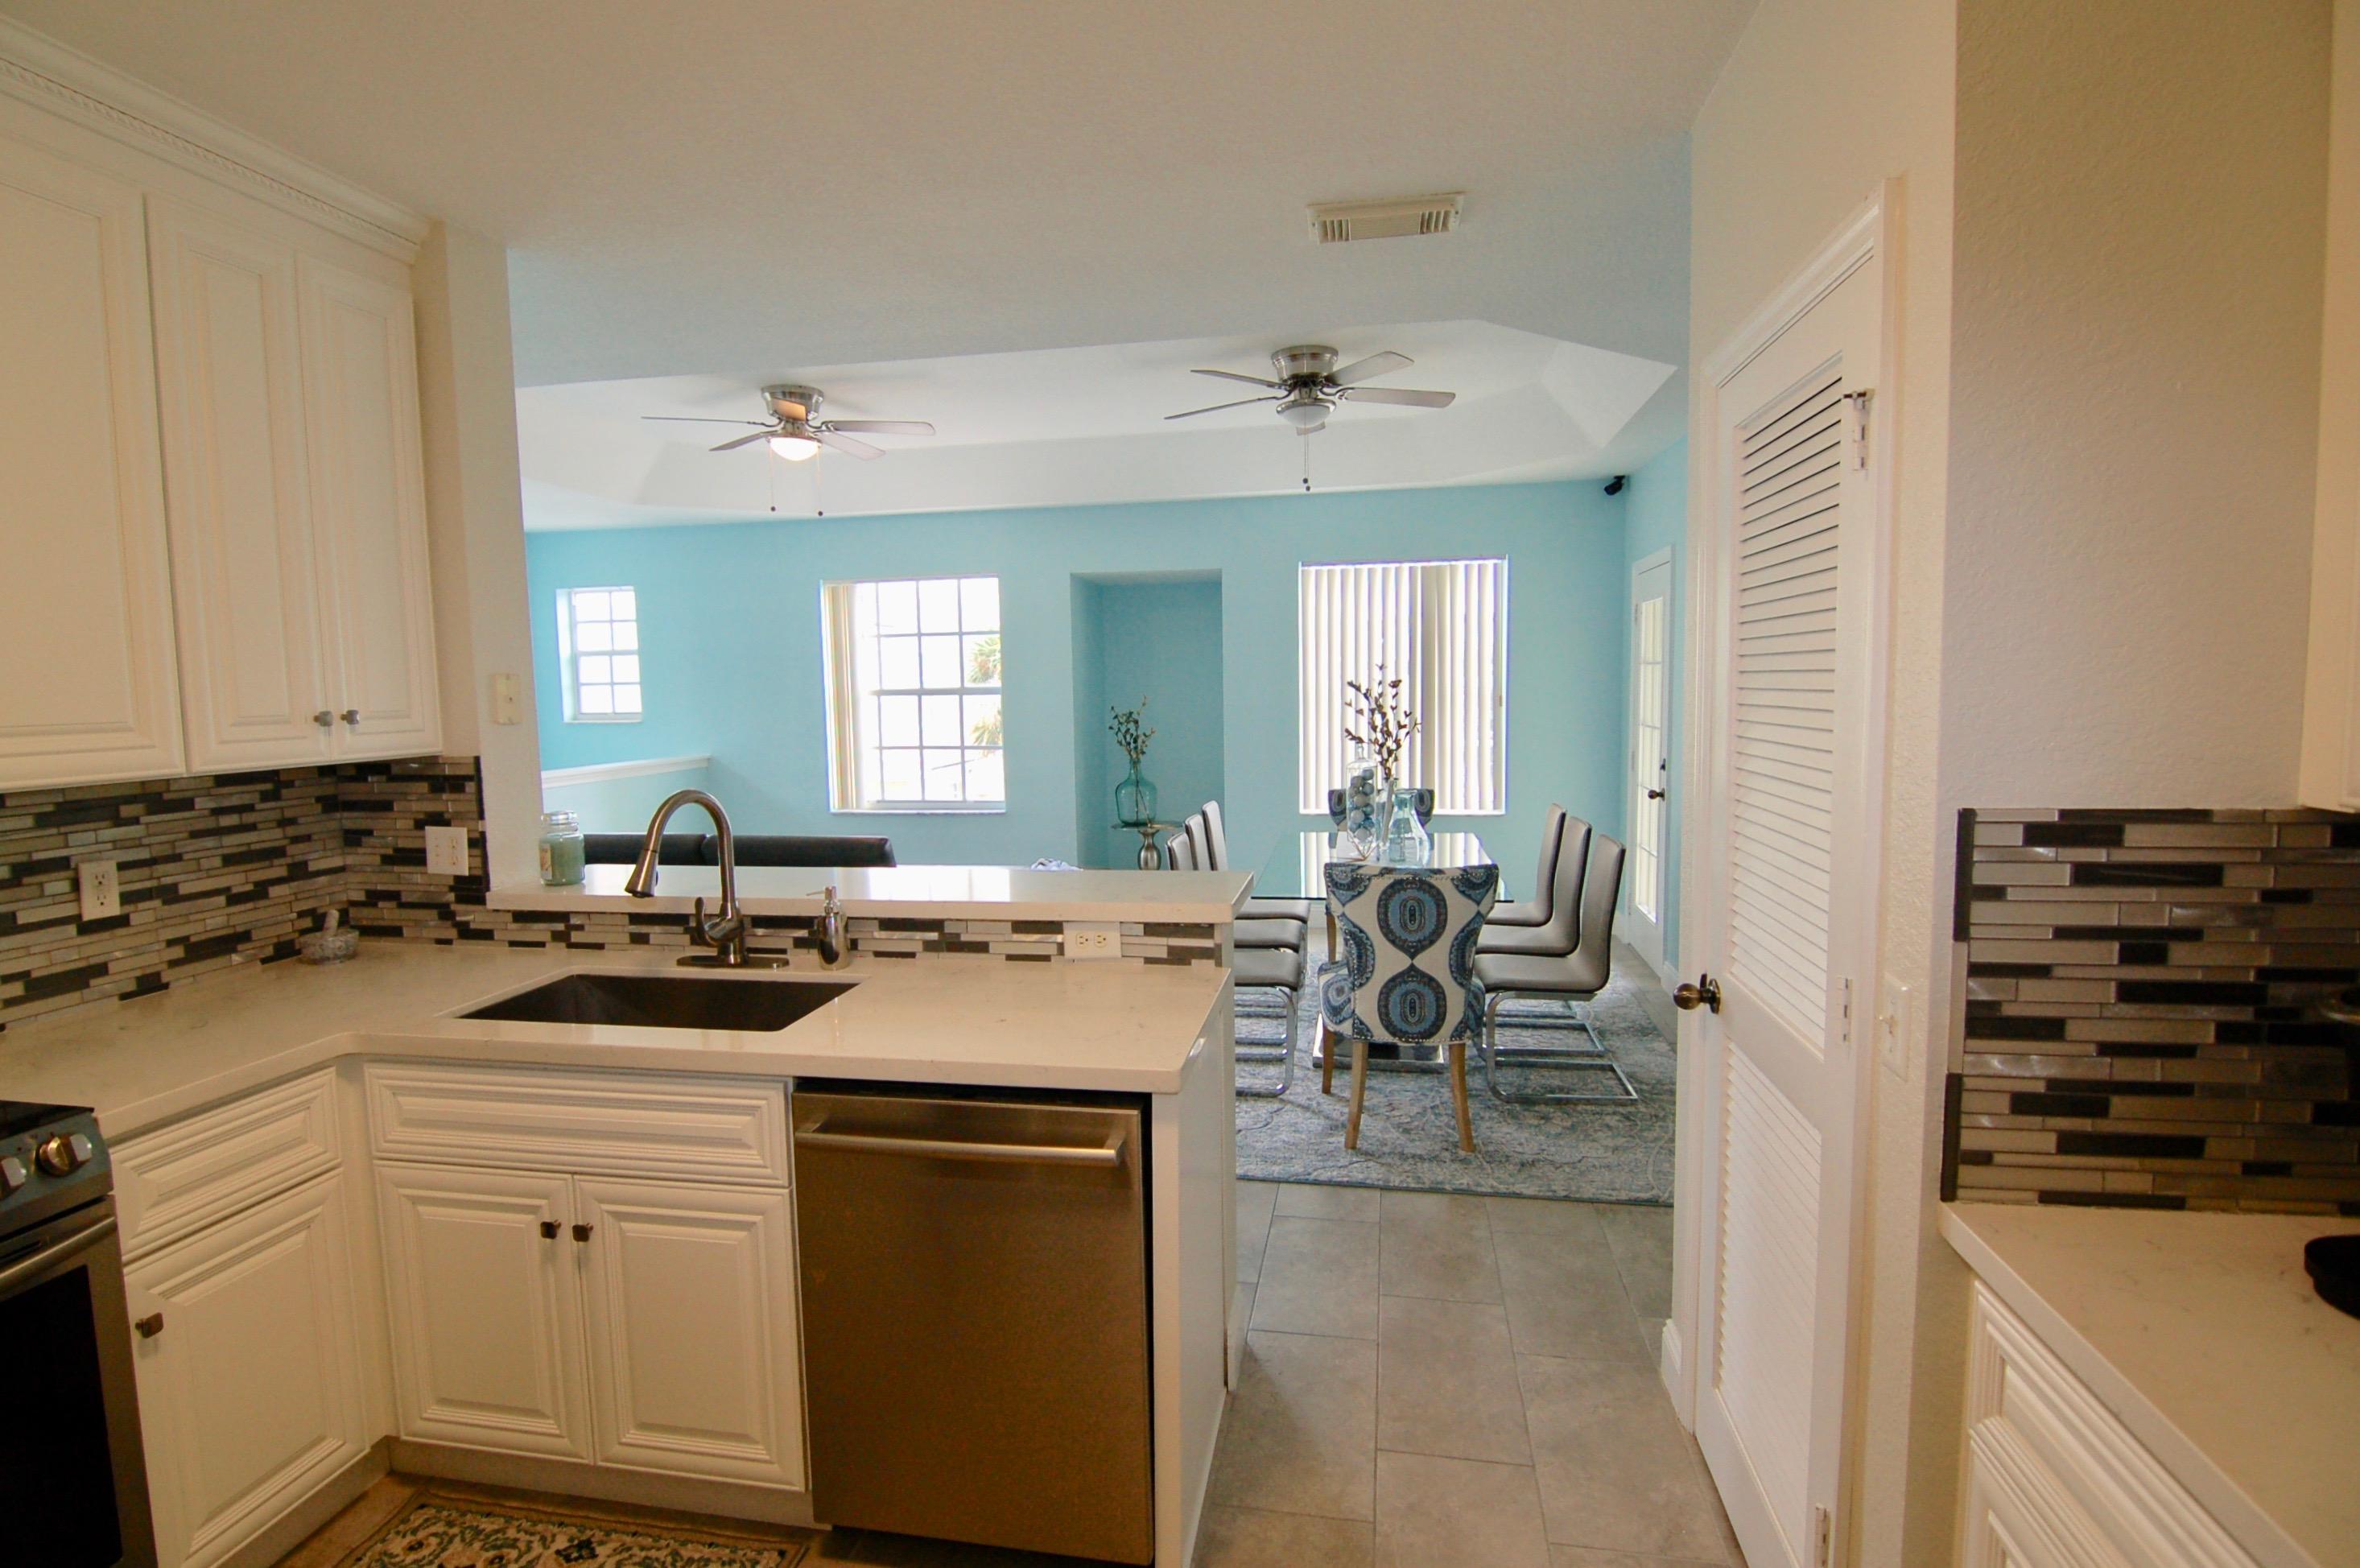 1401 Belmont Place, Boynton Beach, Florida 33436, 2 Bedrooms Bedrooms, ,2 BathroomsBathrooms,Condo/Coop,For Sale,Belmont,2,RX-10497449